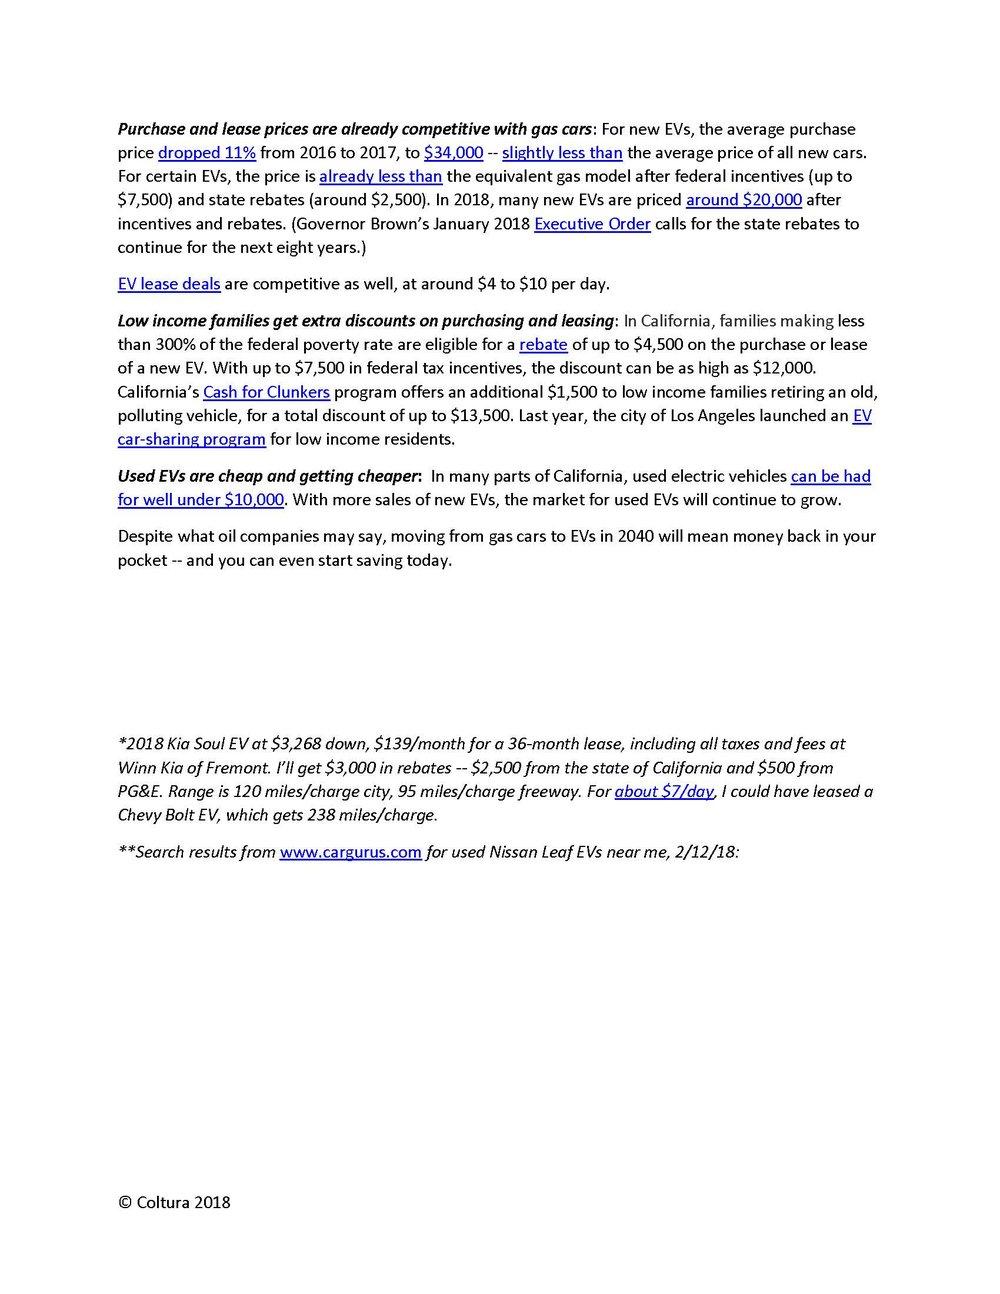 180227 Coltura EV affordability _Page_4.jpg